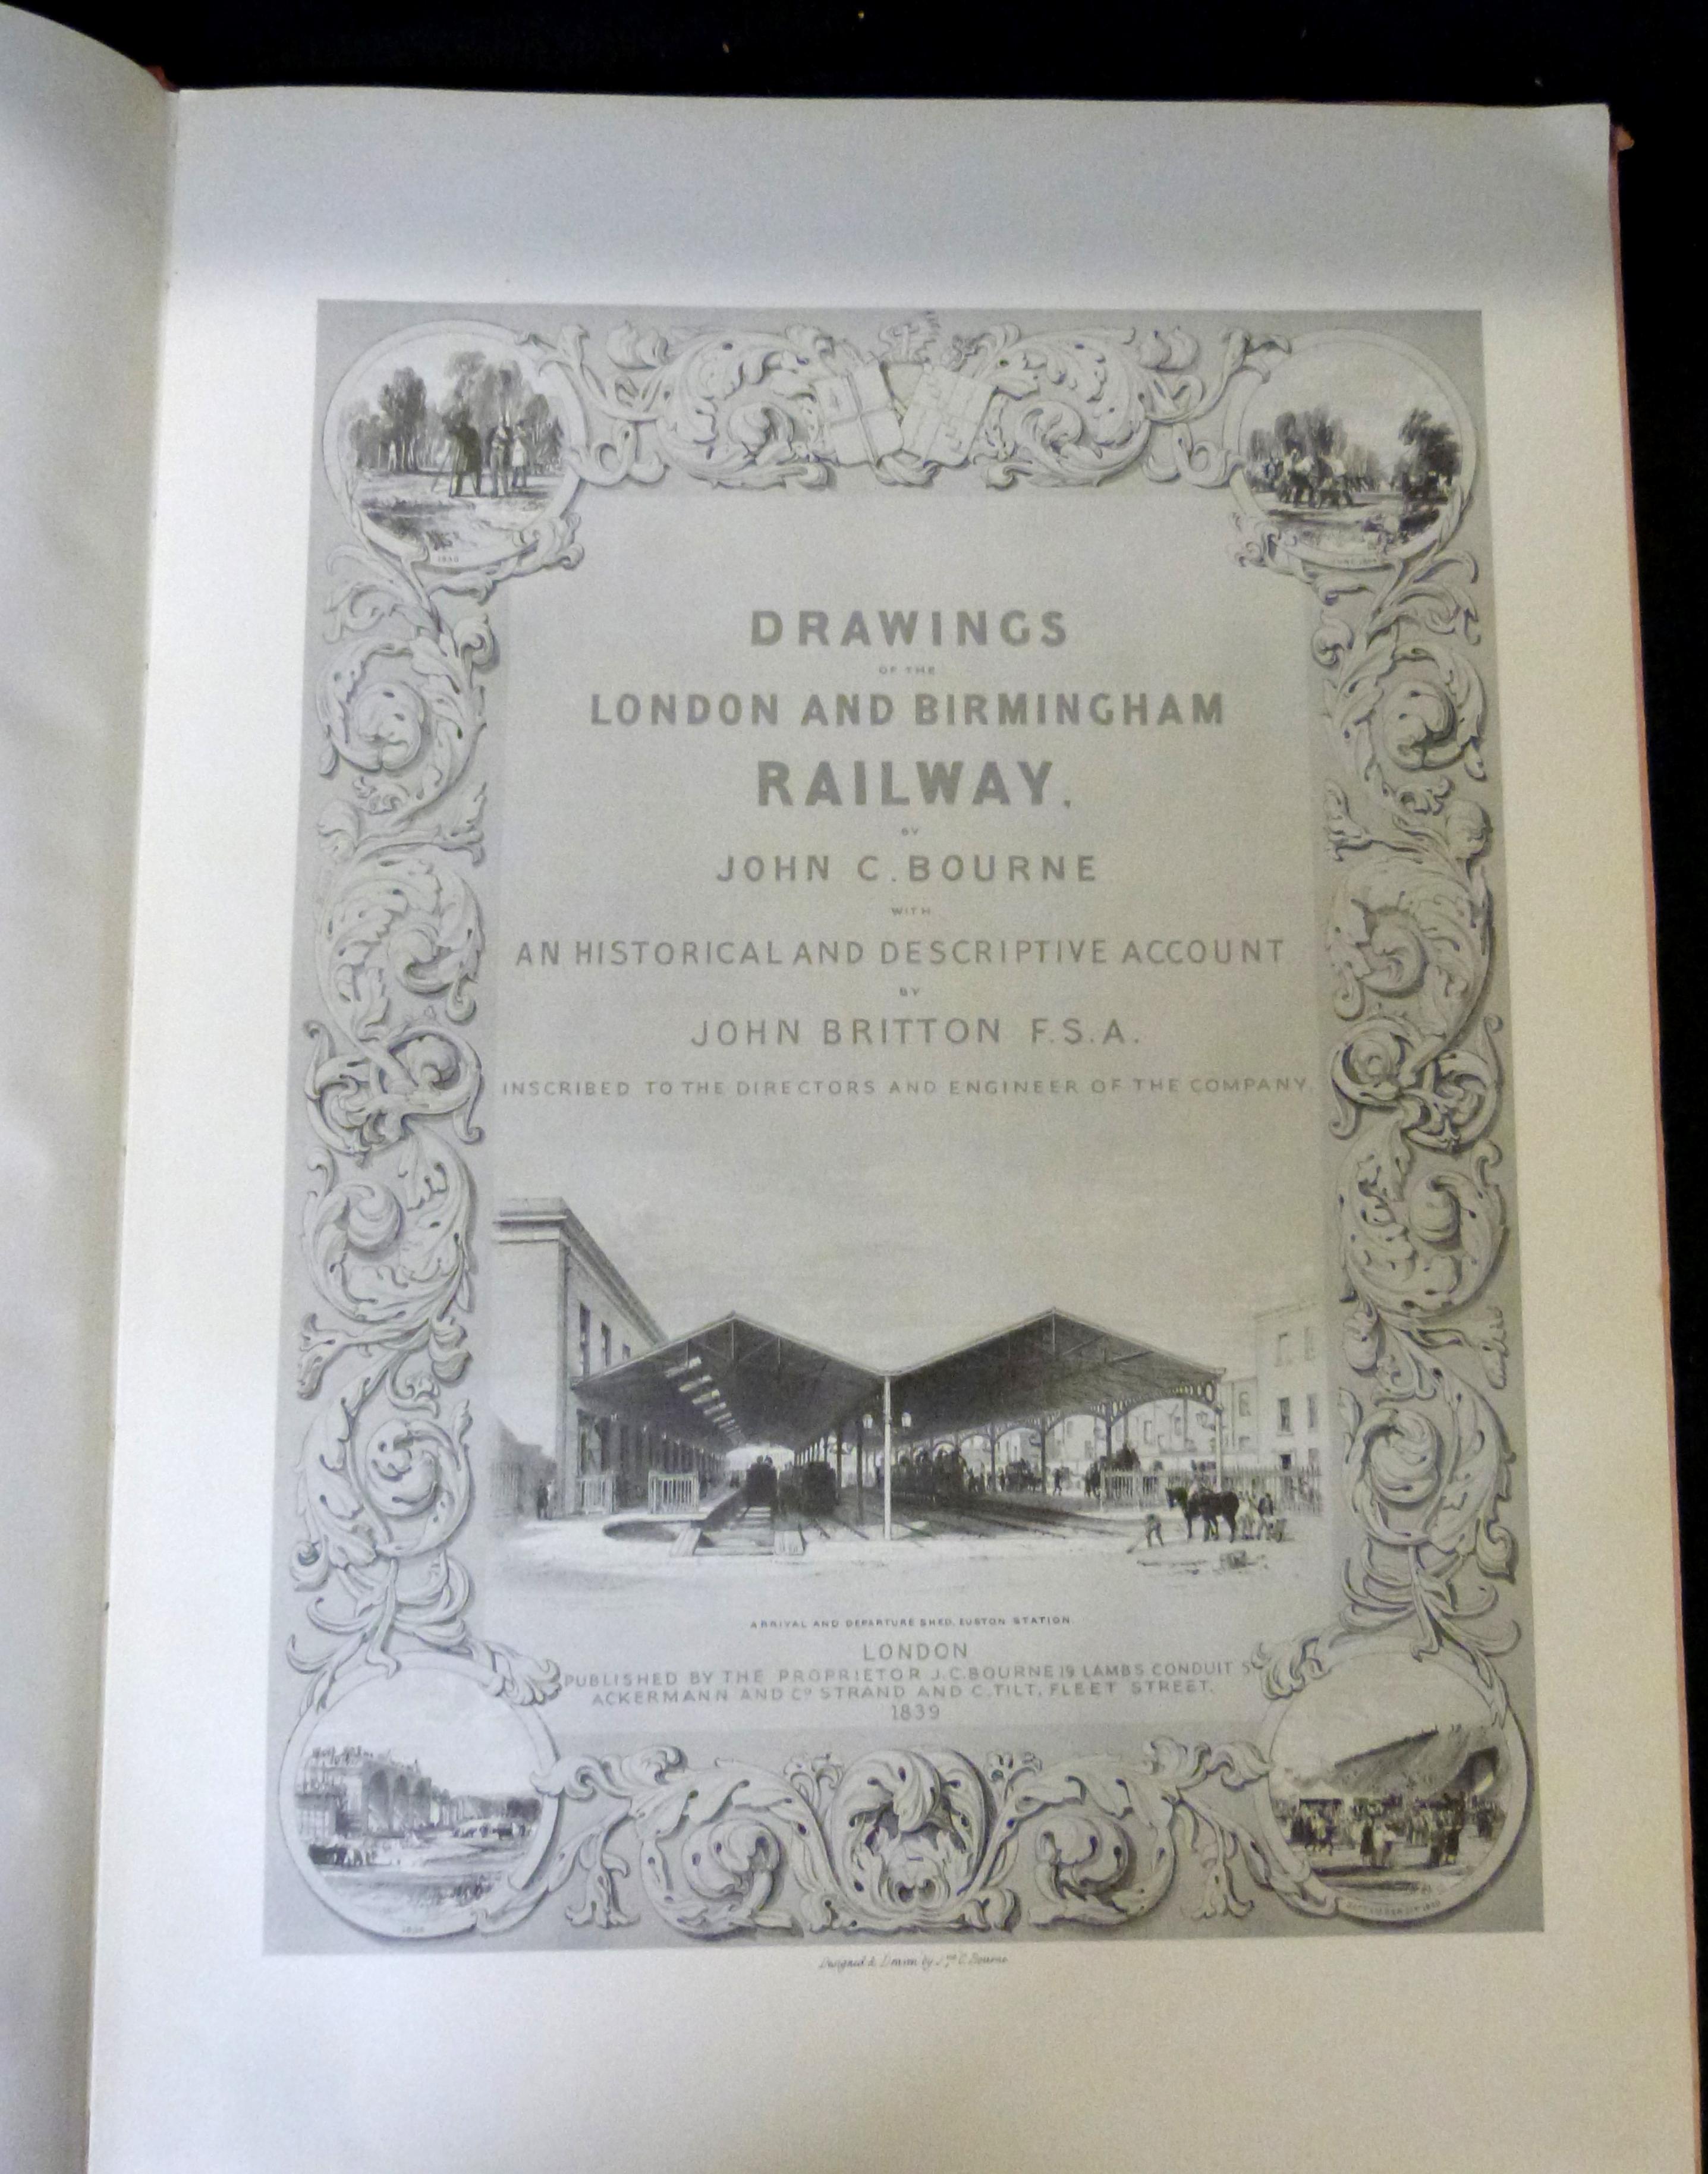 JOHN C BOURNE: BOURNE'S LONDON AND BIRMINGHAM RAILWAY, Newton Abbot, David & Charles, 1970, - Image 3 of 4